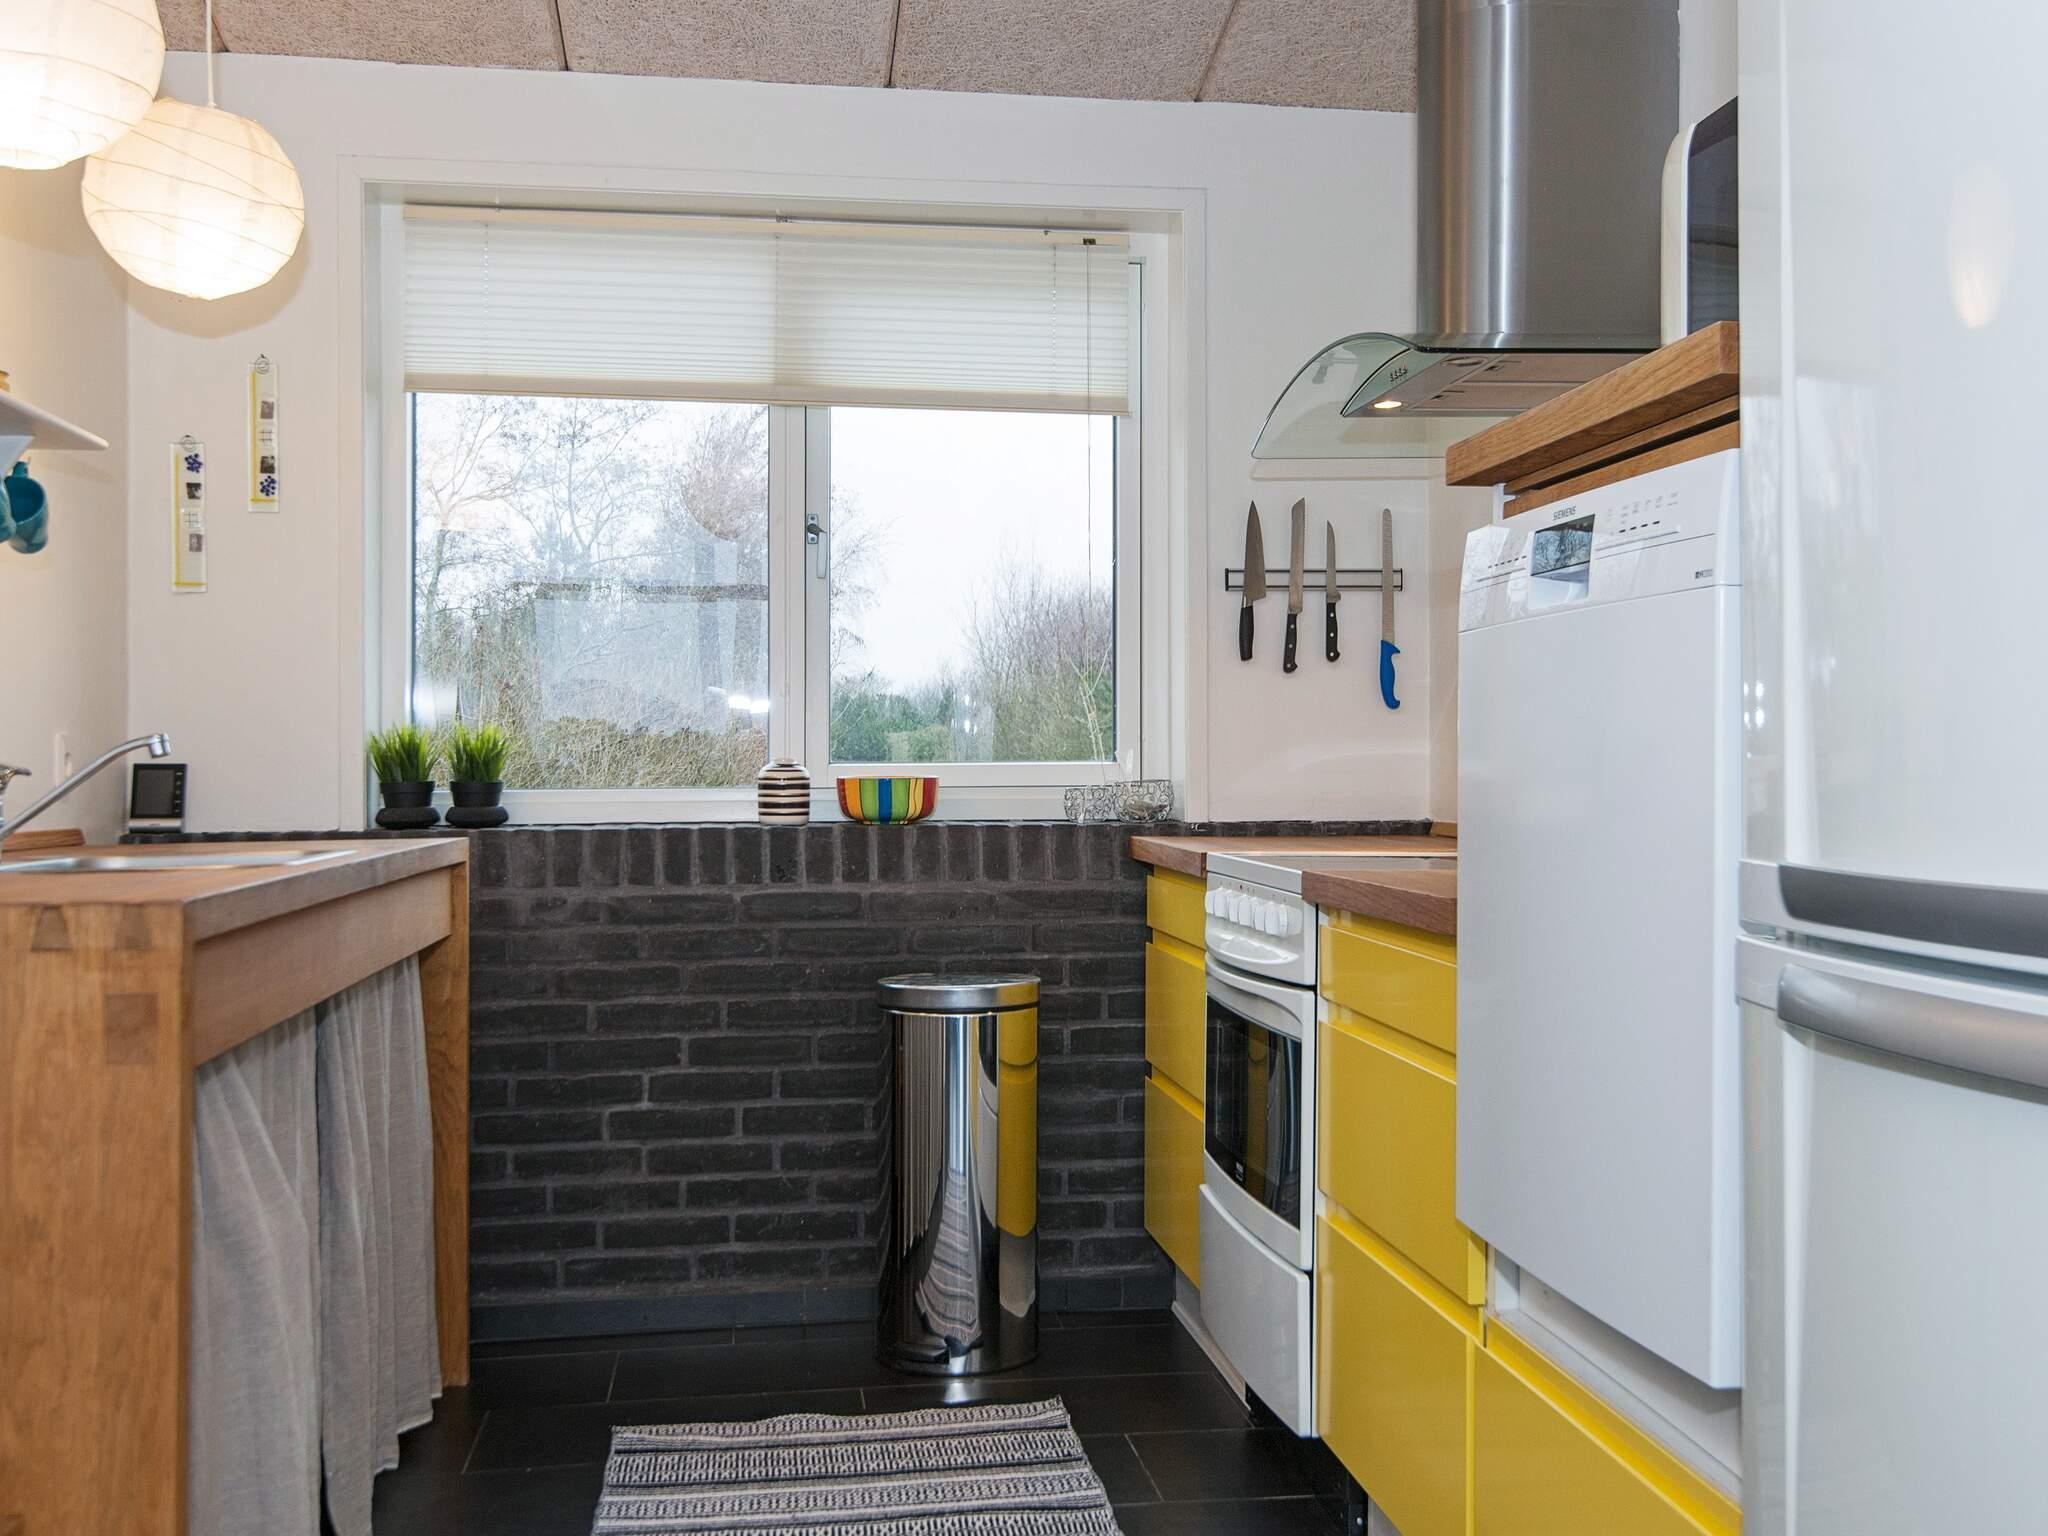 Ferienhaus Skaven Strand (2545767), Tarm, , Westjütland, Dänemark, Bild 5